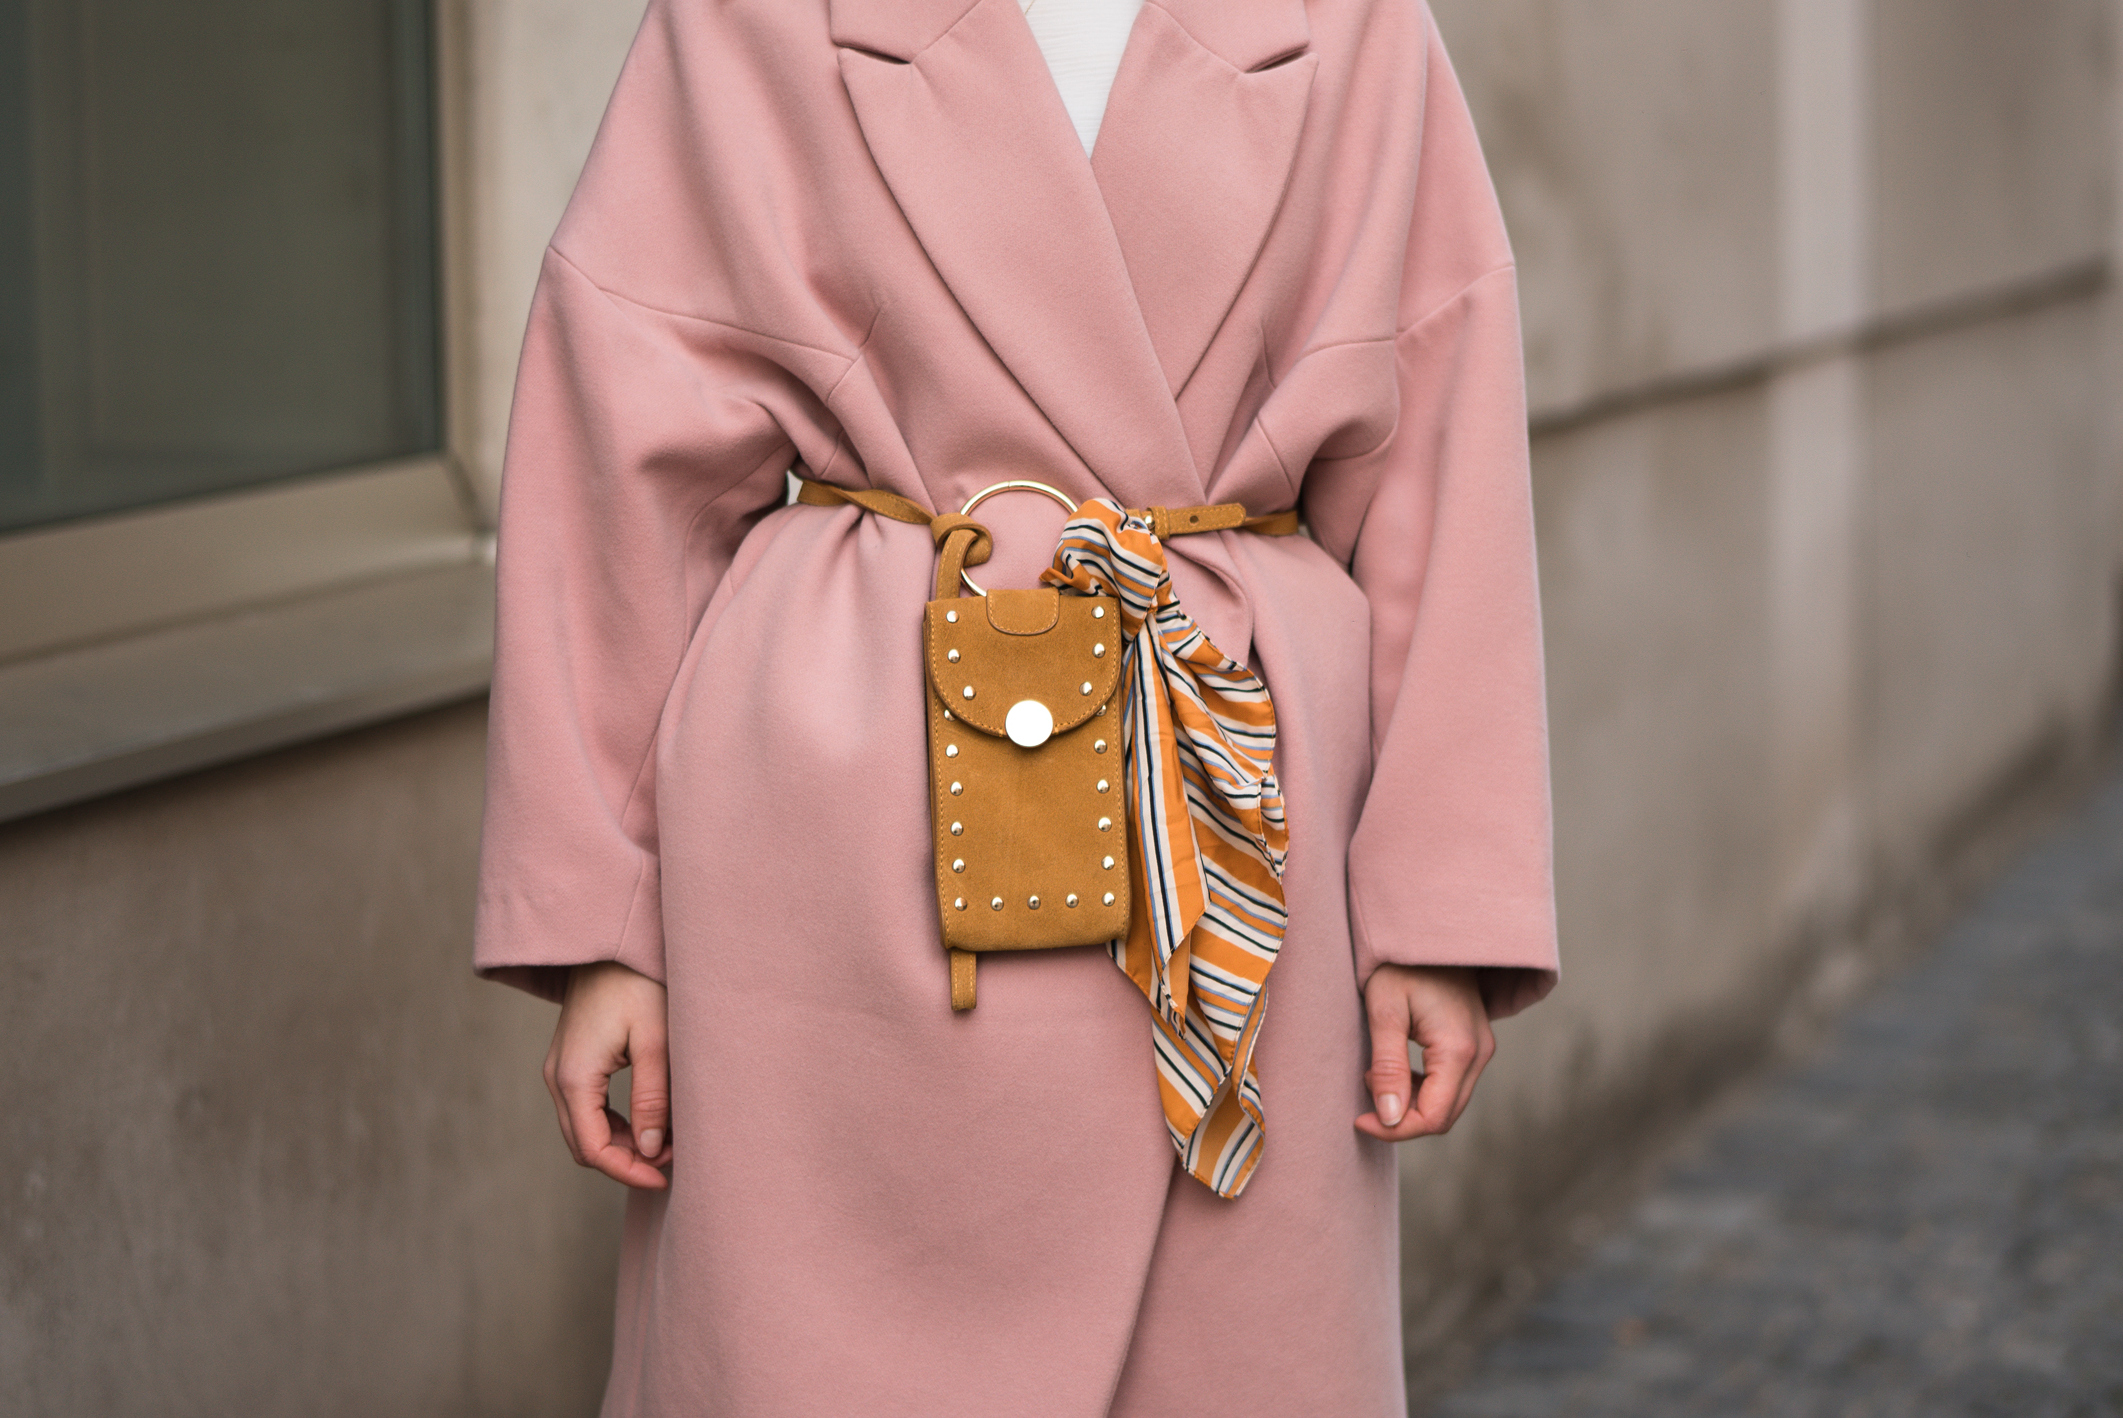 Pink Coat, Suede Belt Bag Velvet Pants rosa Mantel Seidentuch Fashion Week Berlin Jakes Samthose oversize Streetstyle Sariety Fashionblogger Modeblog Heidelberg_13-001